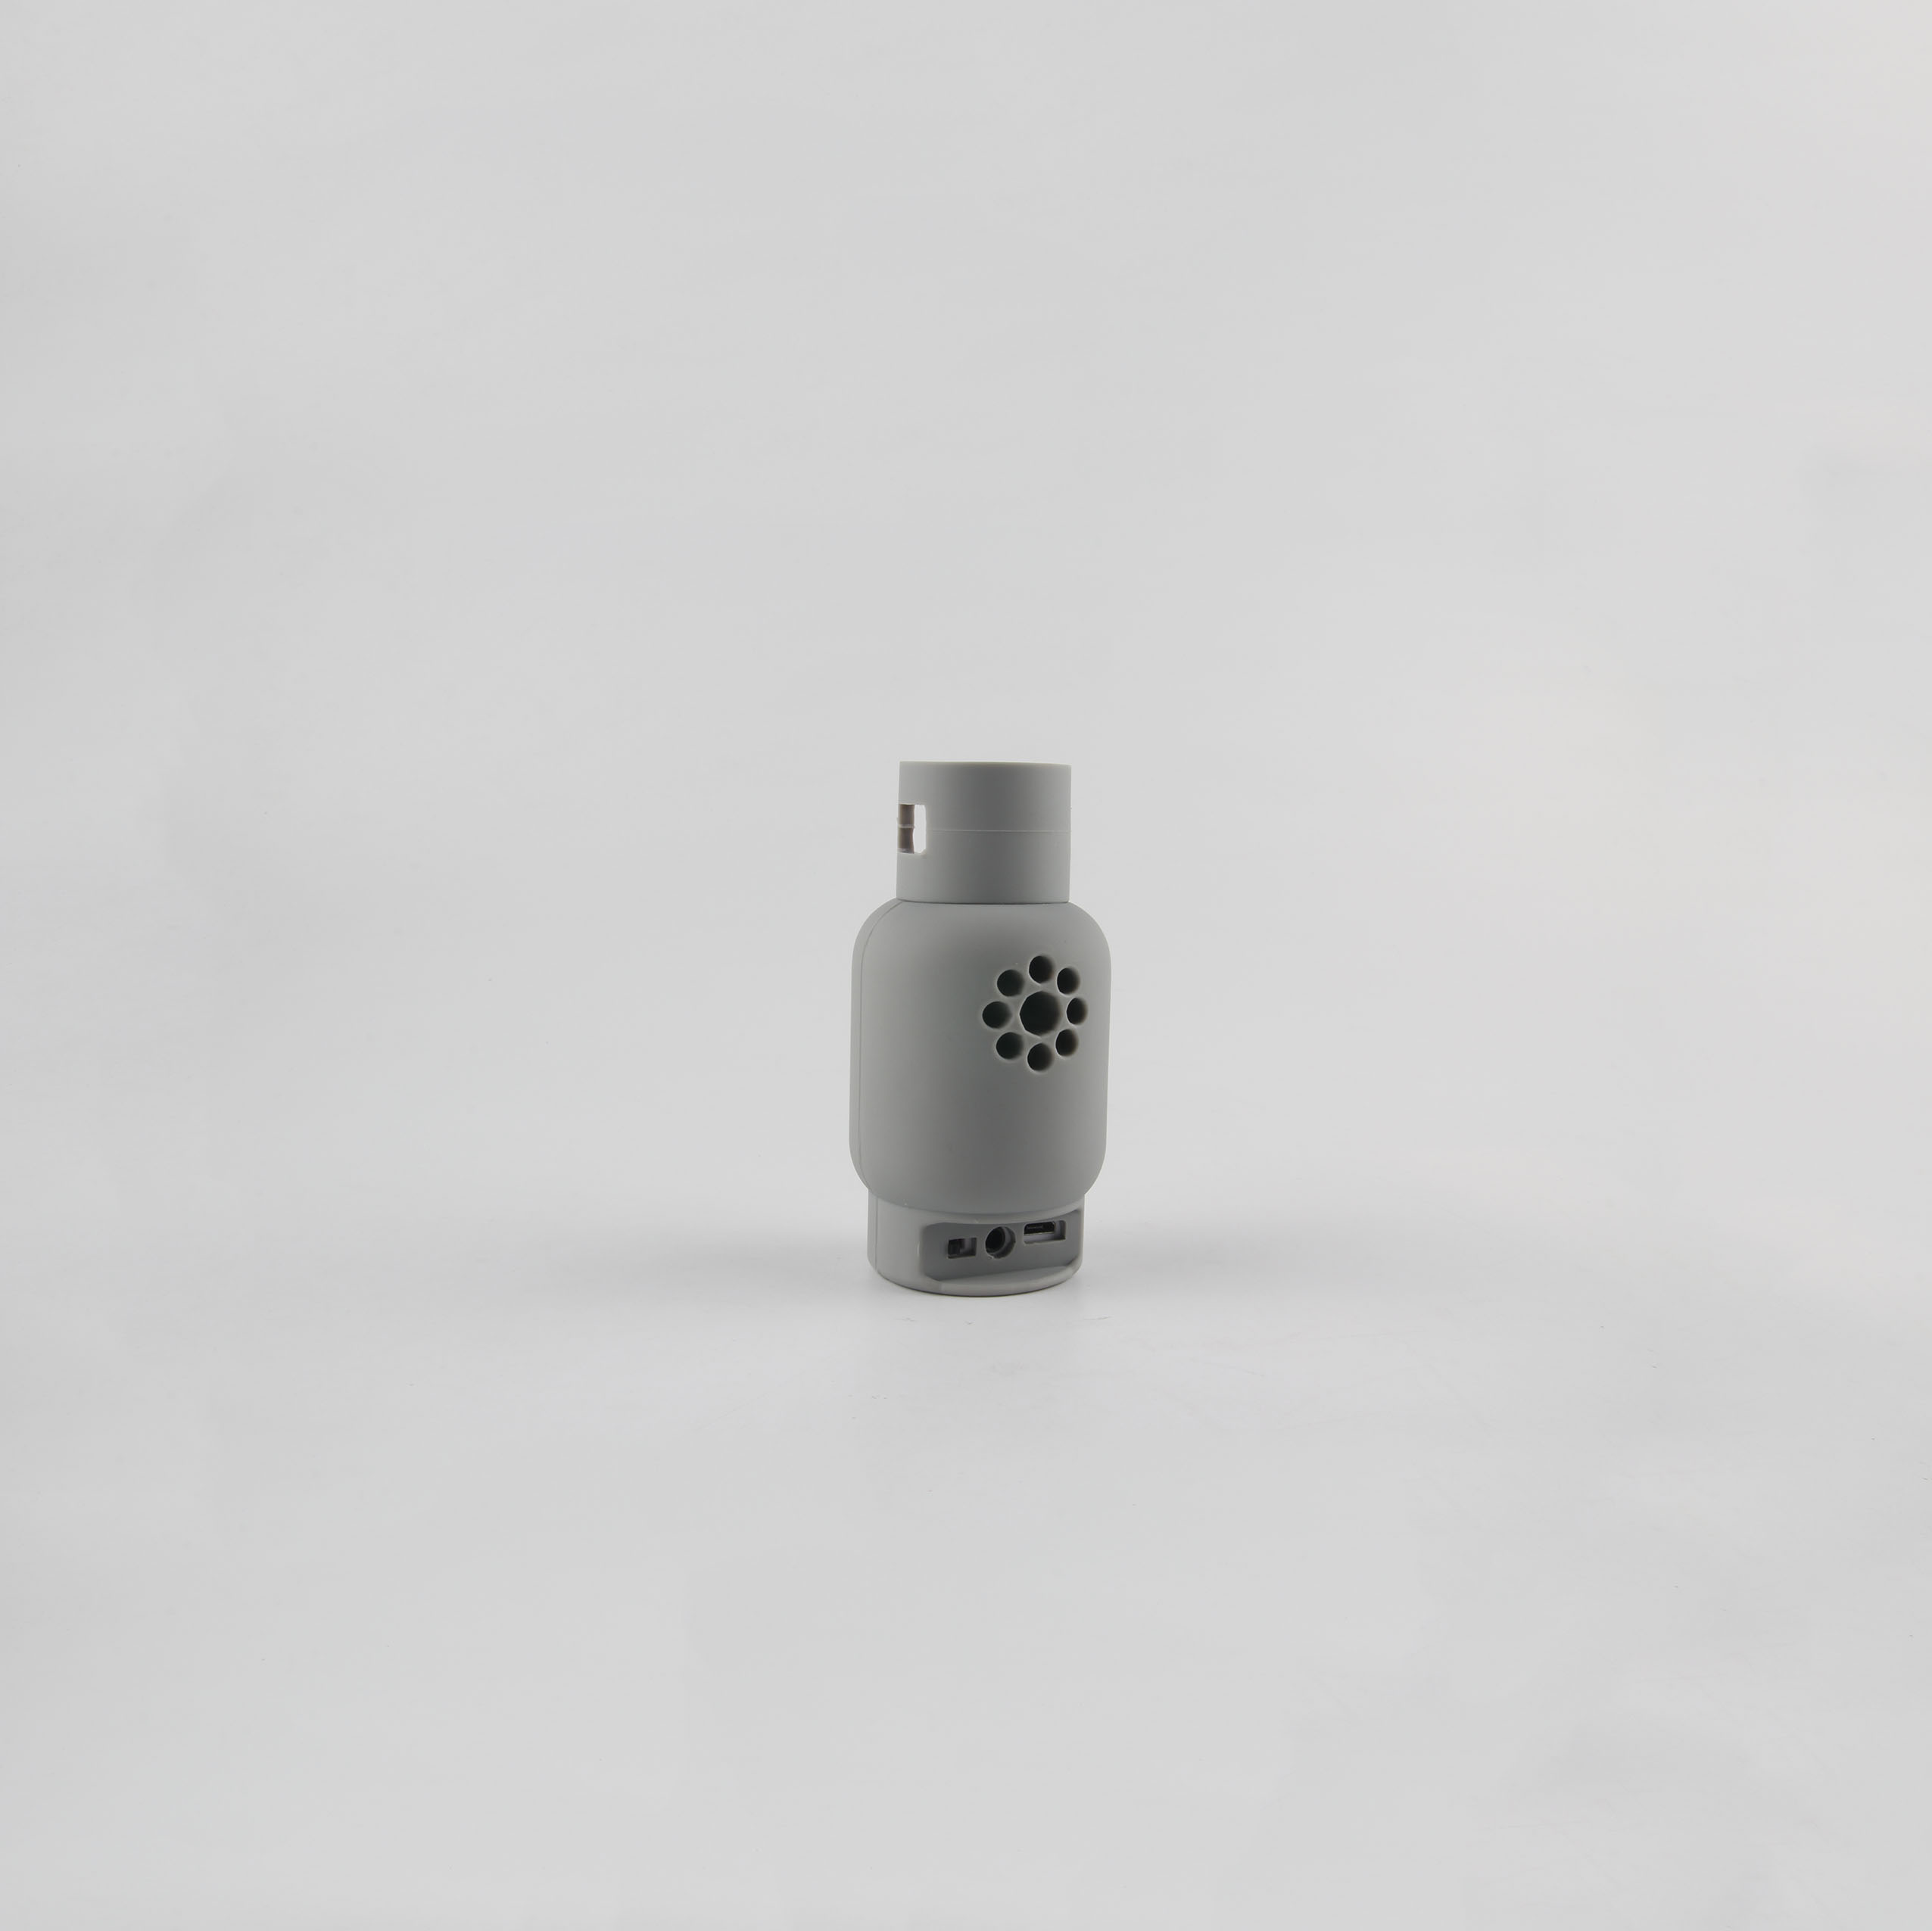 4 ohm speaker 15 watt professional can soft pvc speaker